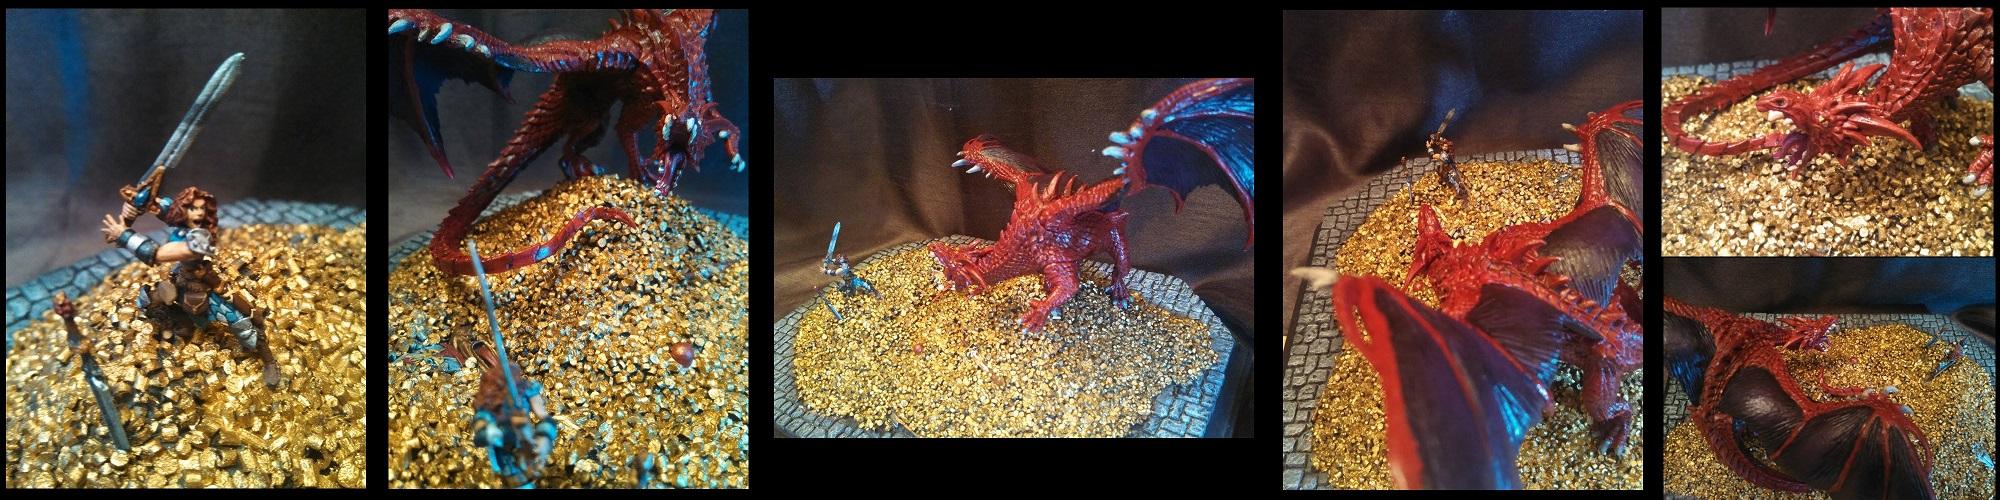 Dragon's Horde